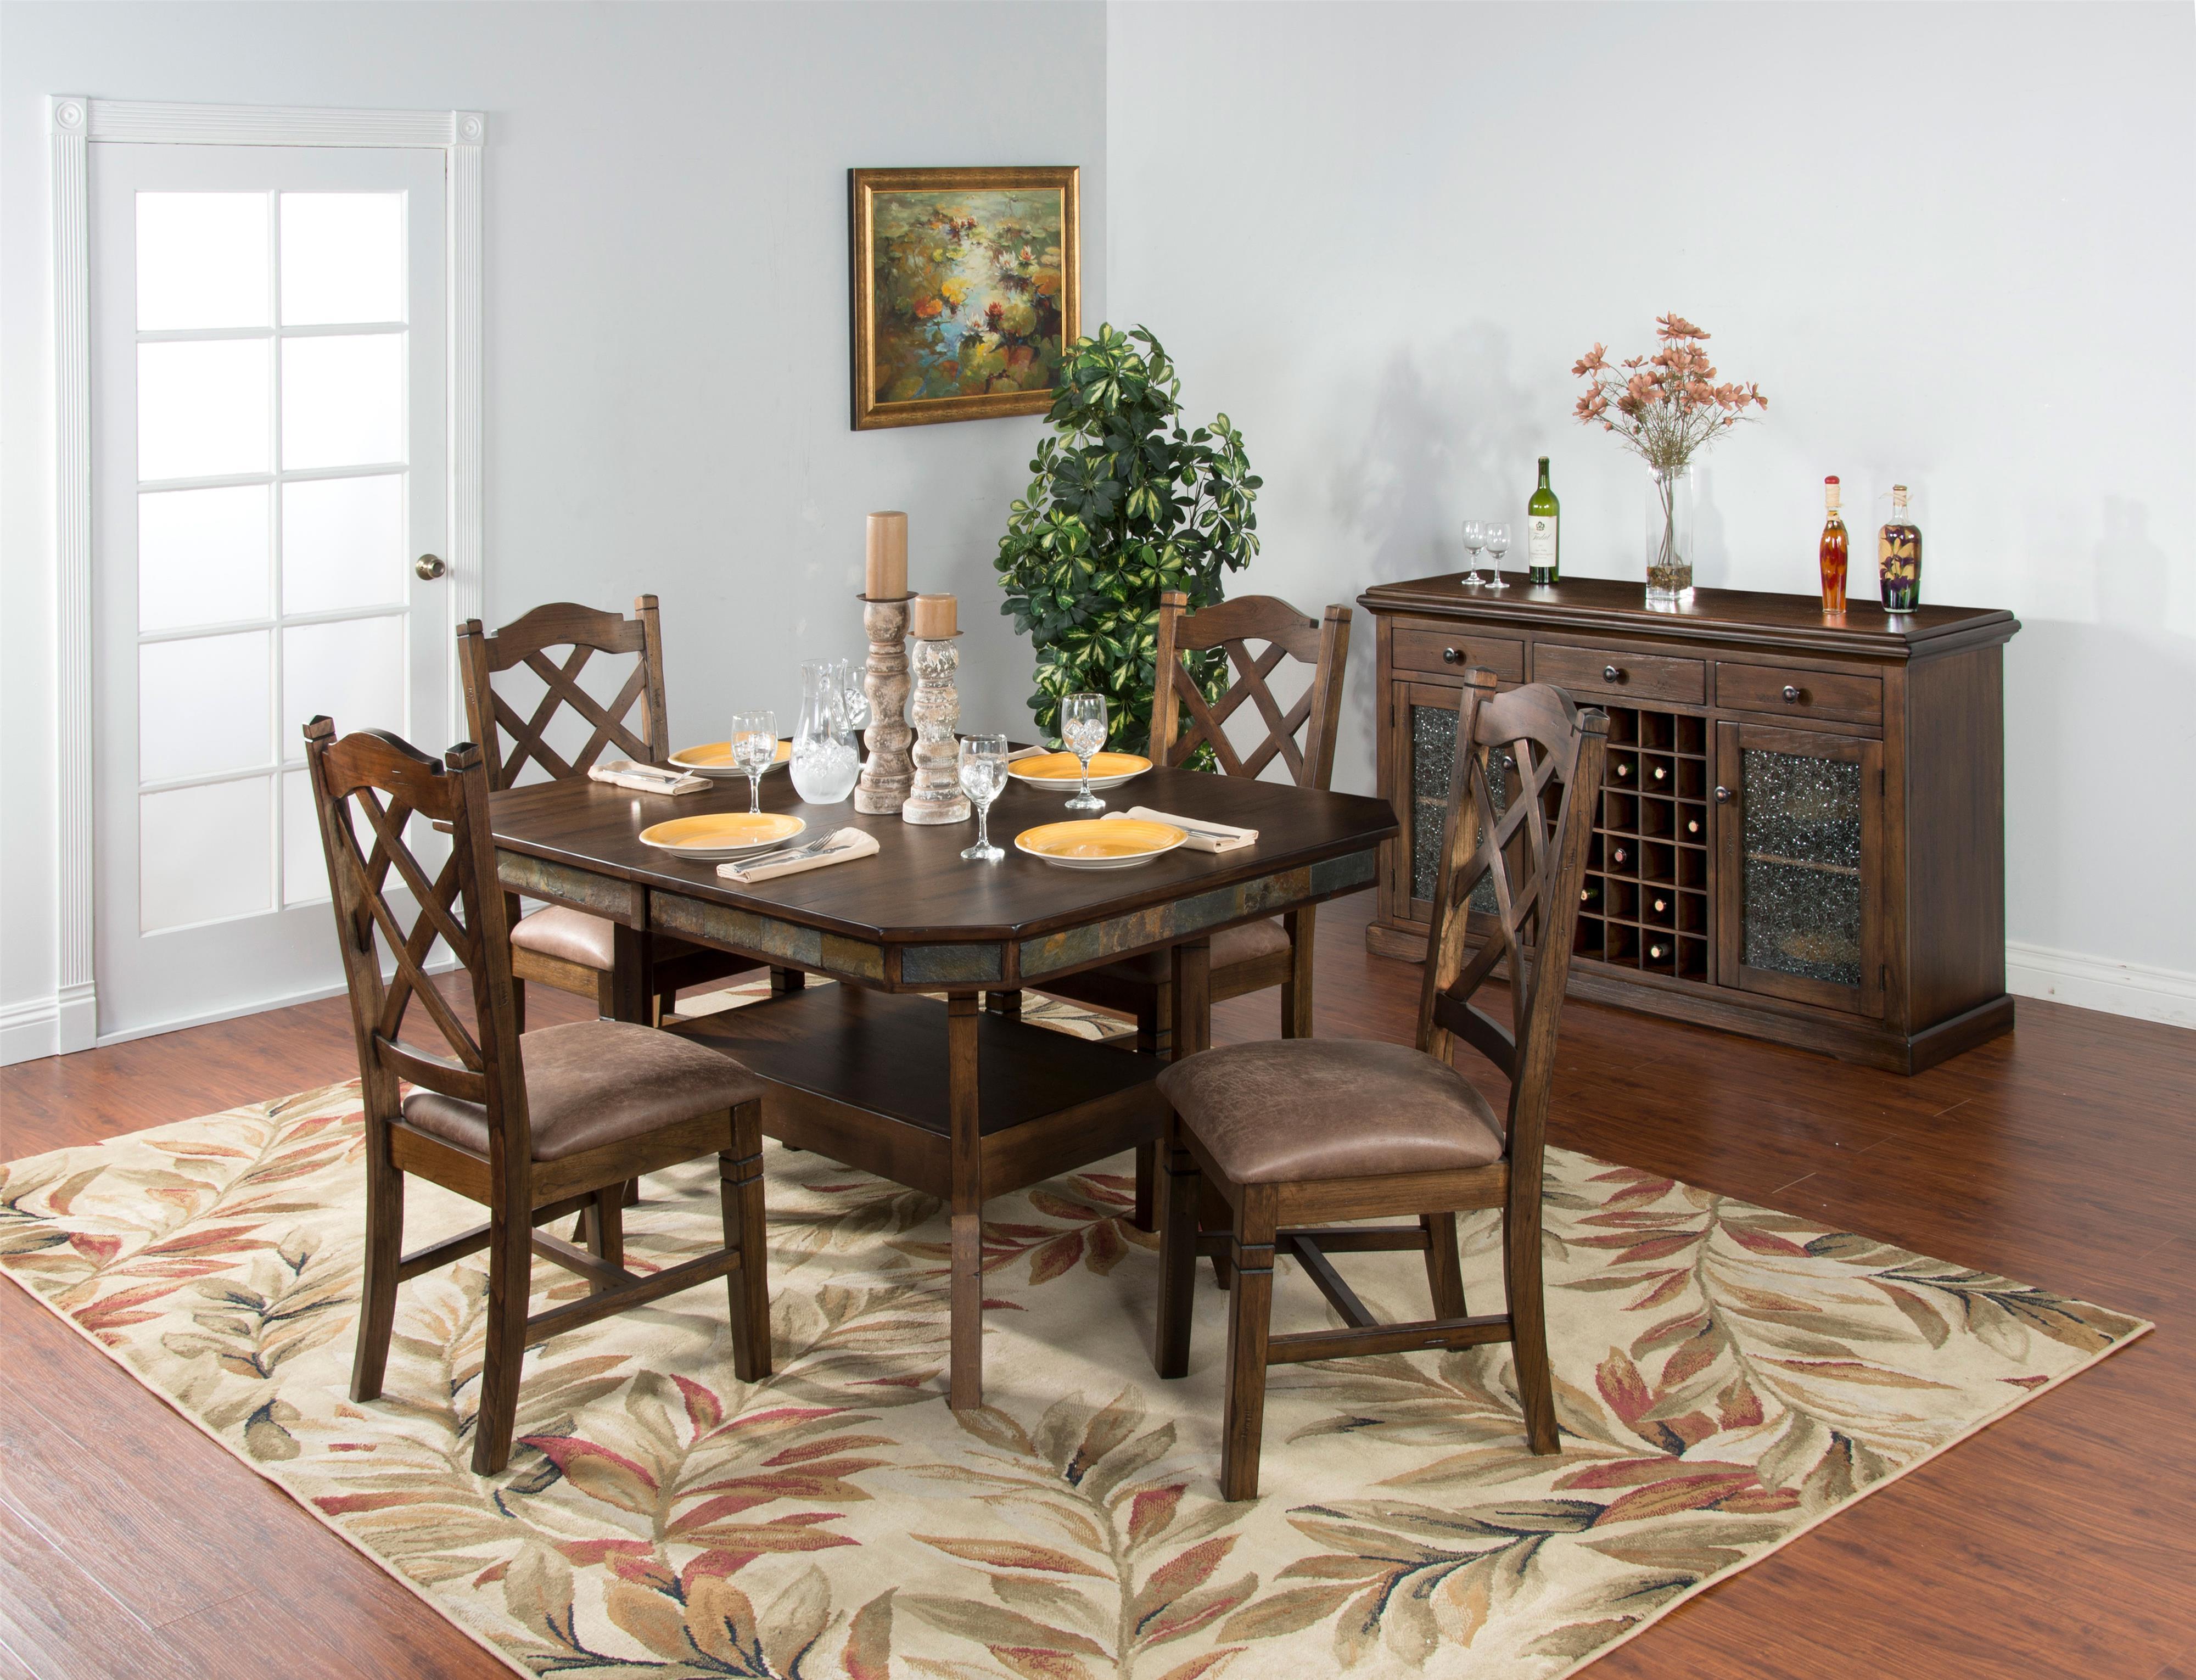 Sunny Designs Savannah Wood Rocker W/ Cushion Seat U0026 Back | Walkeru0027s  Furniture | Wood Rockers Spokane, Kennewick, Tri Cities, Wenatchee, Coeur  Du0027Alene, ...